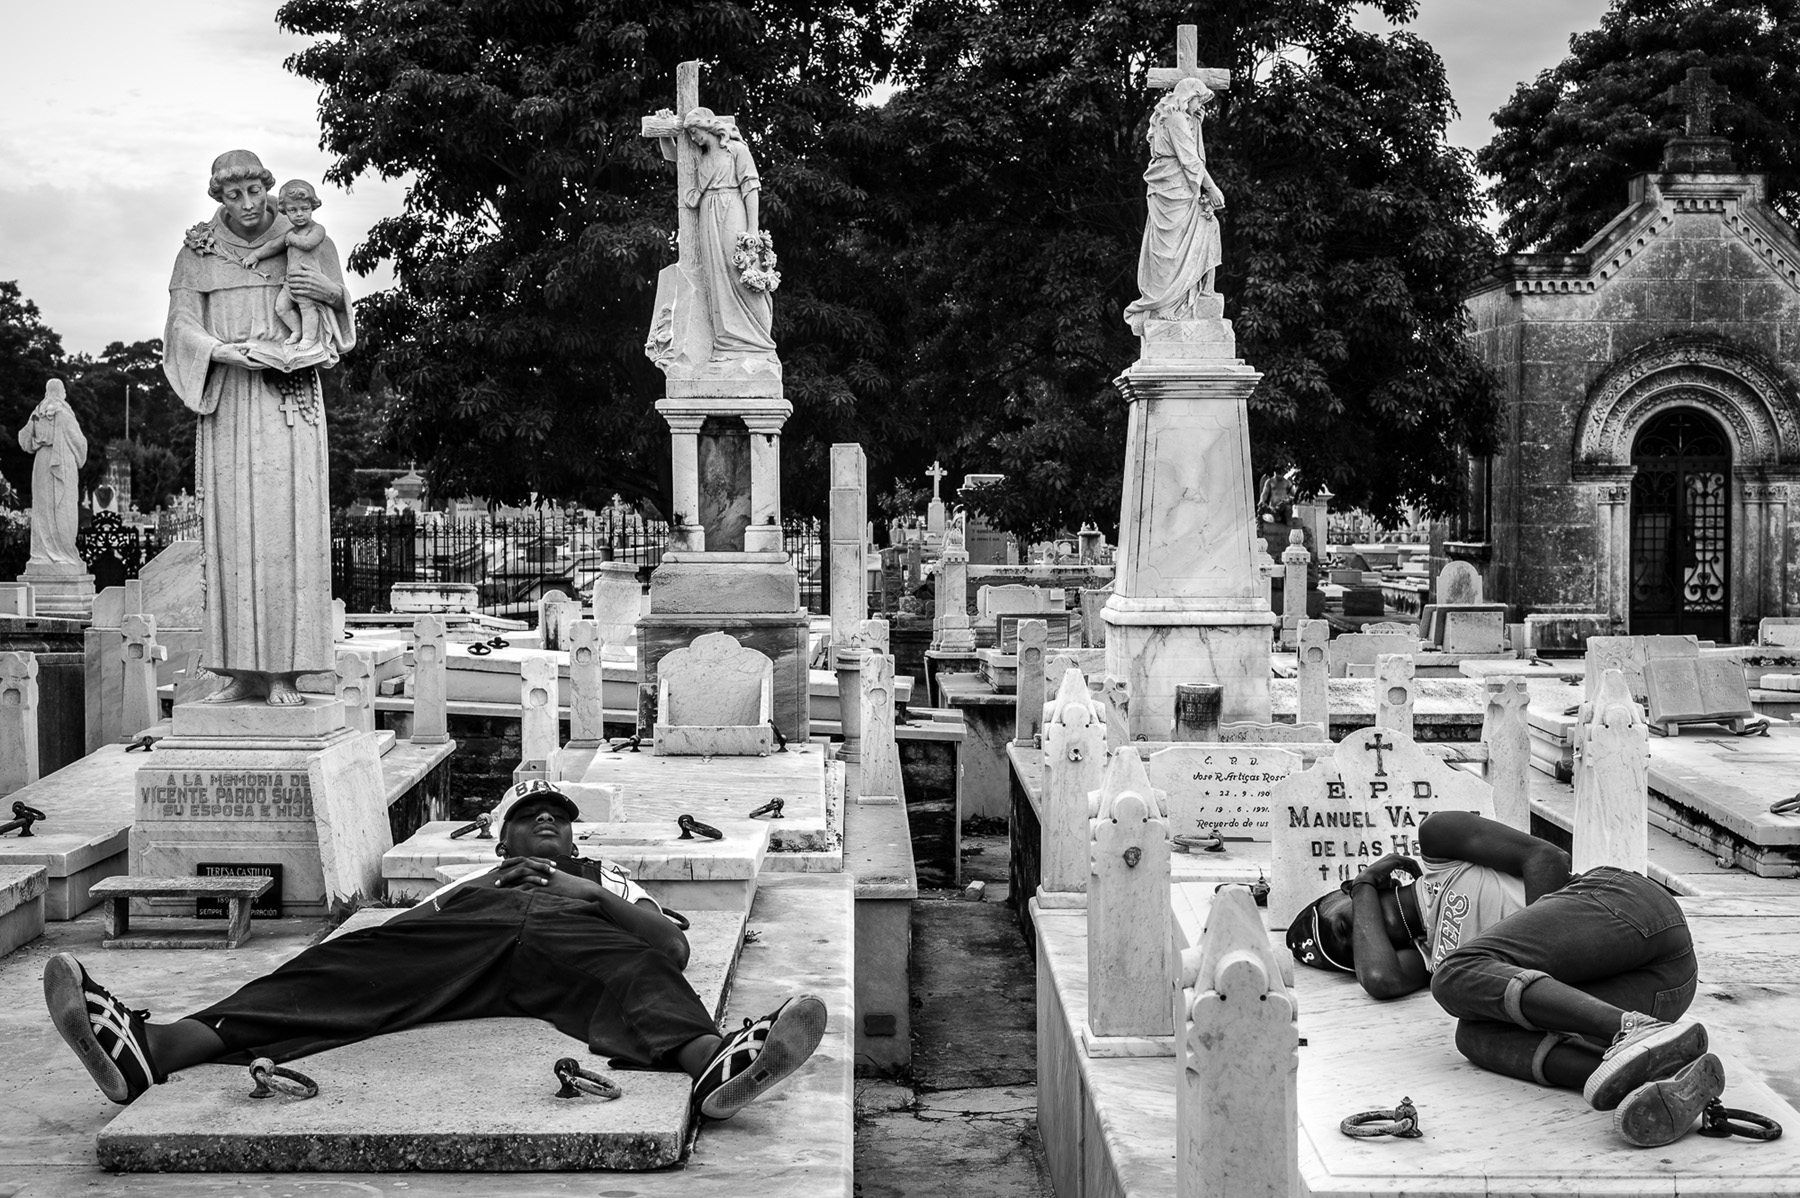 Cemeterio Colón, Havana.